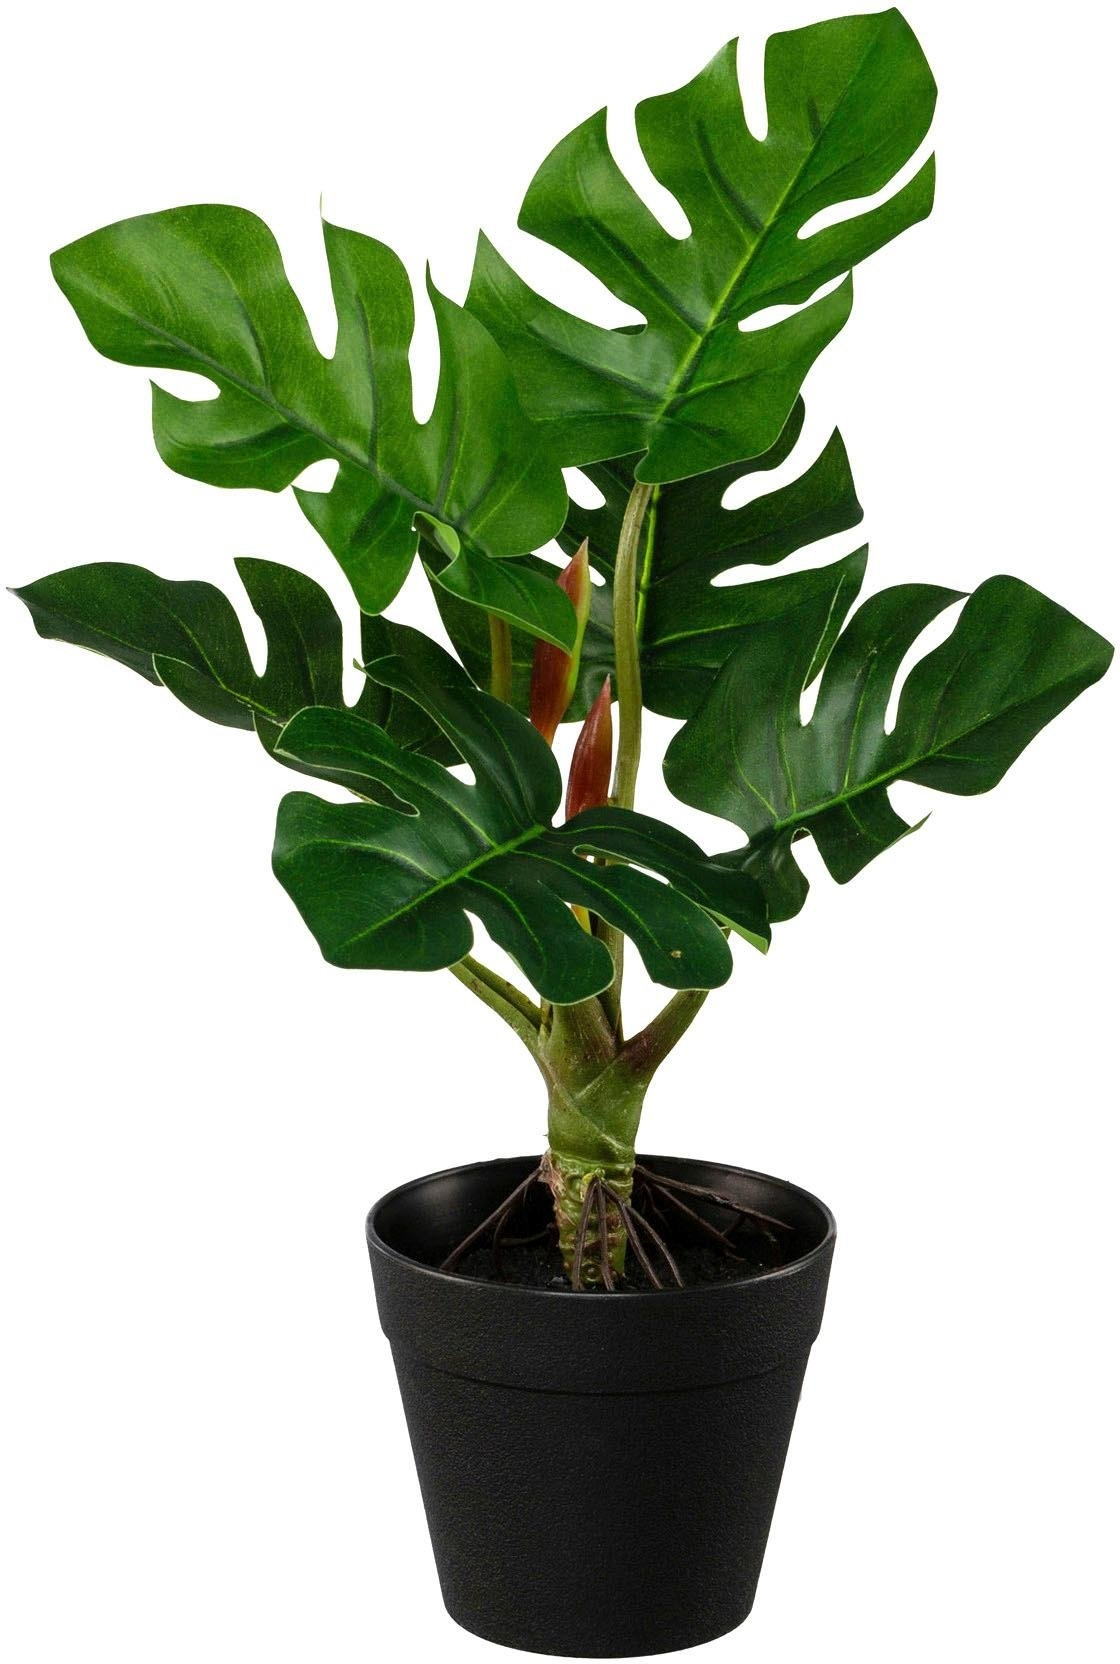 Creativ Green kunst-potplanten »Set aus Grünpflanzen« bestellen: 30 dagen bedenktijd